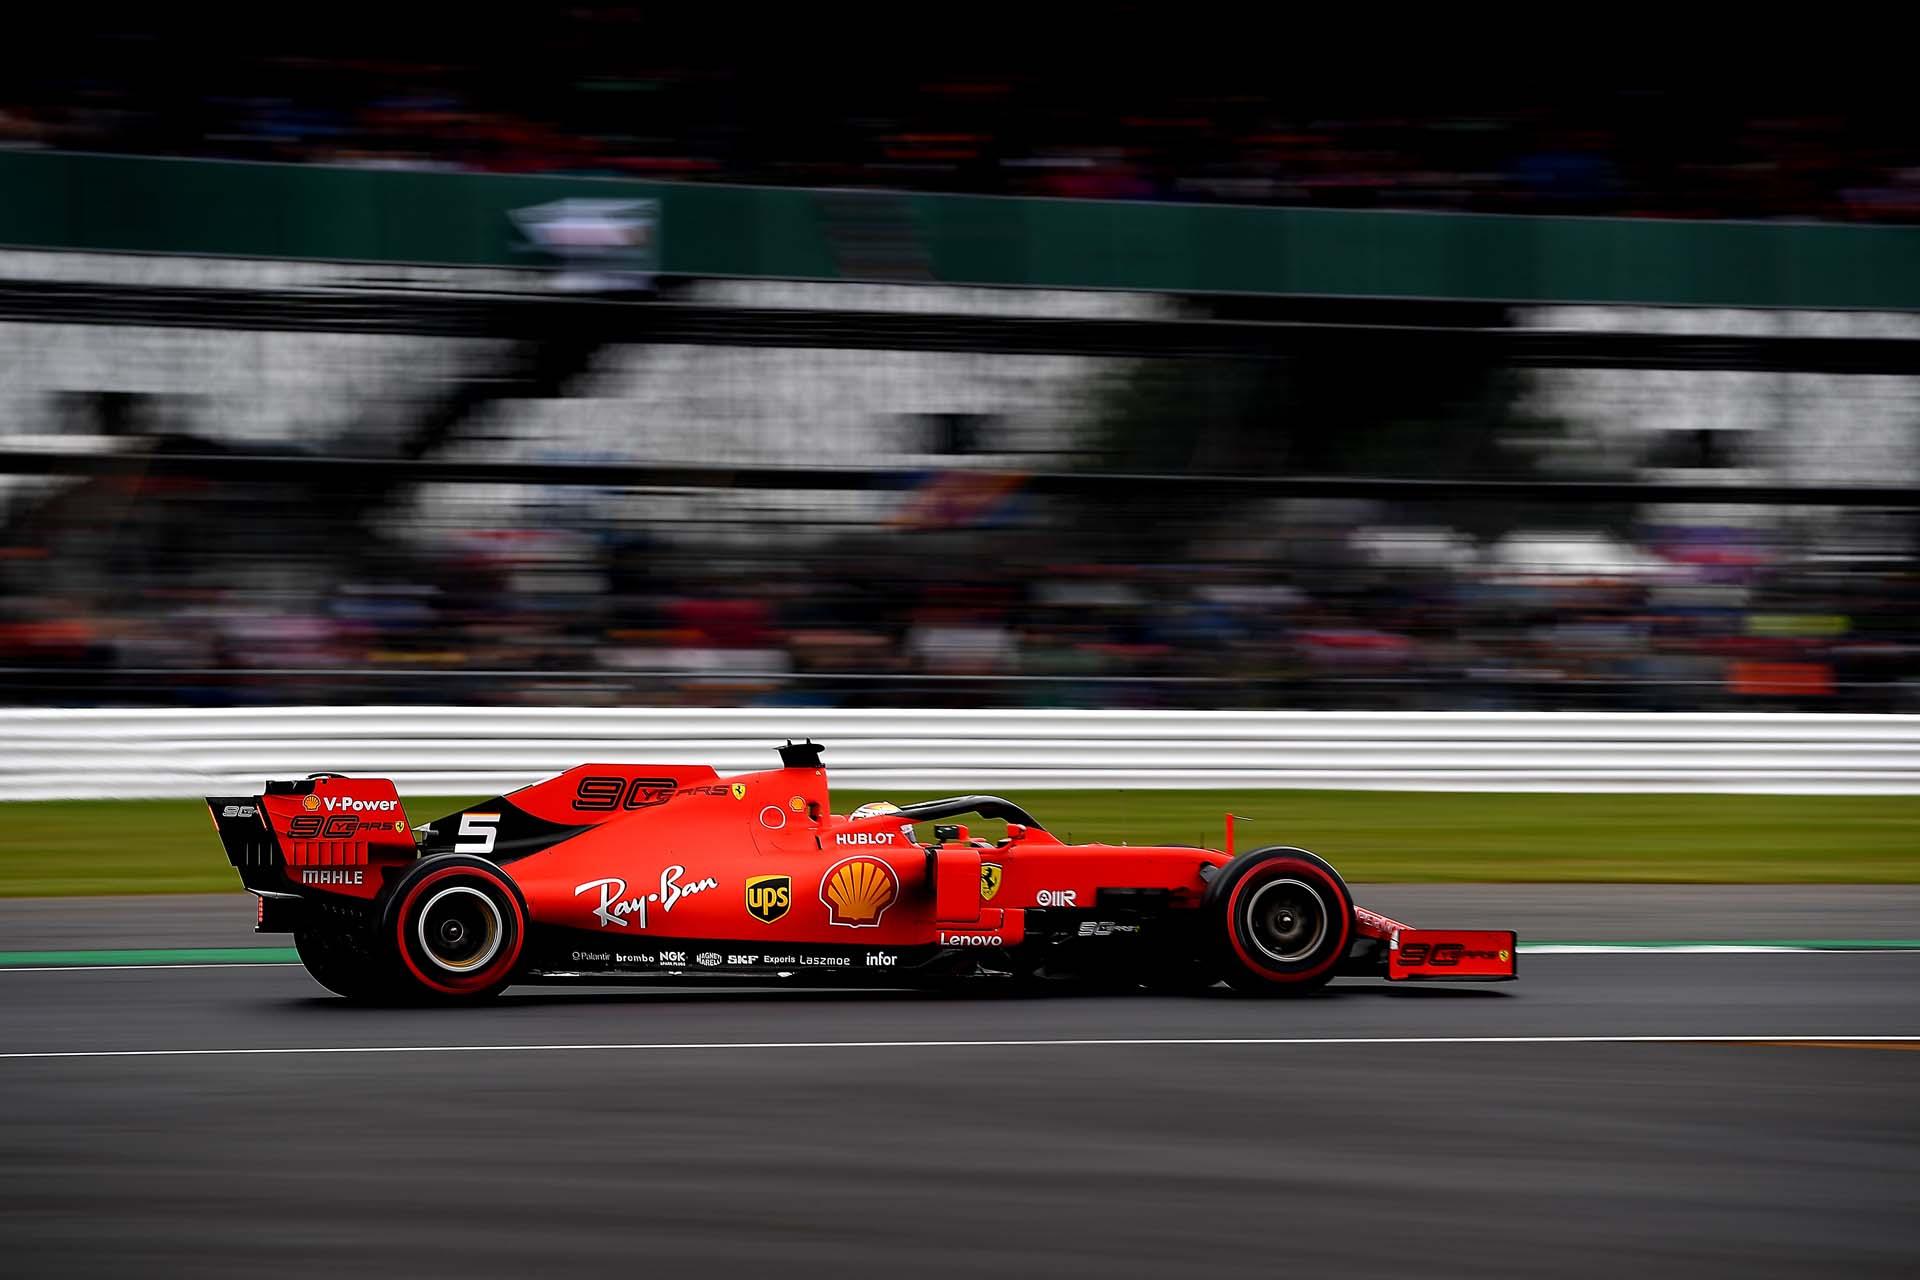 GP GRAN BRETAGNA F1/2019 - SABATO 13/07/2019 credit: @Scuderia Ferrari Press Office Sebastian Vettel